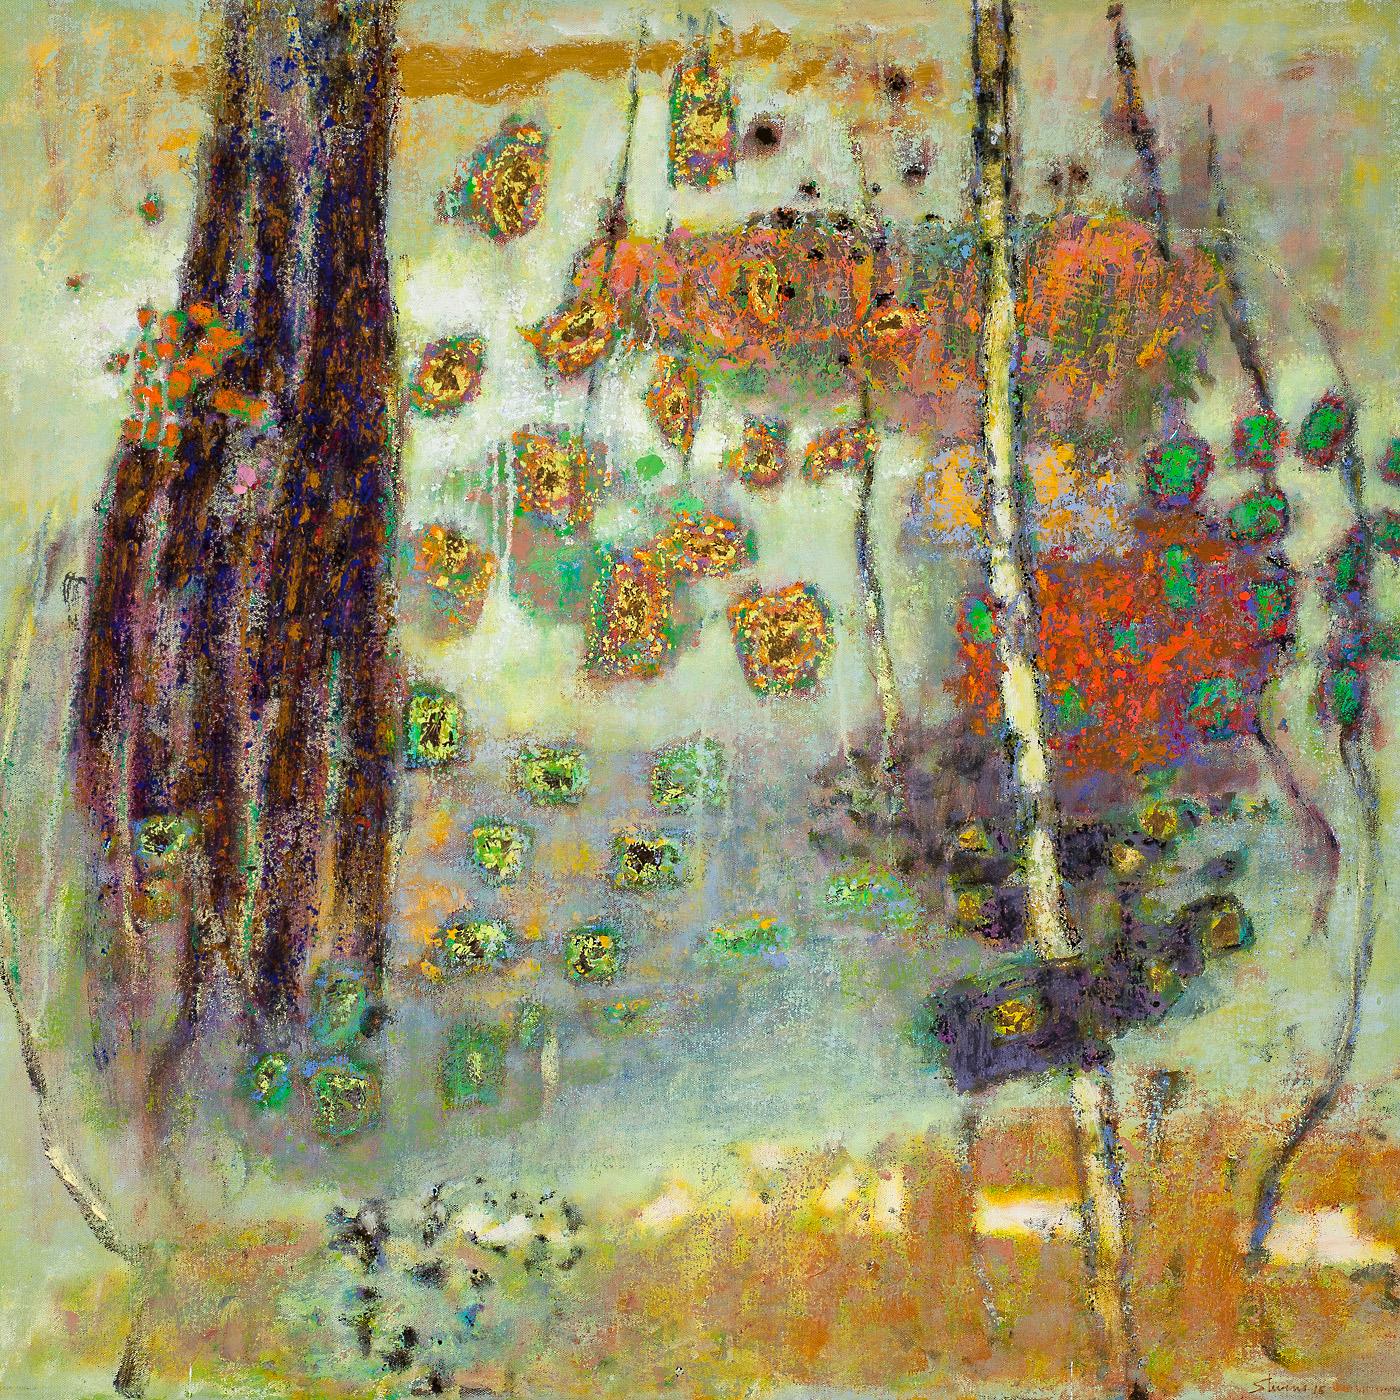 "Impromptu Influences   | oil on canvas | 32 x 32"" | 2015"